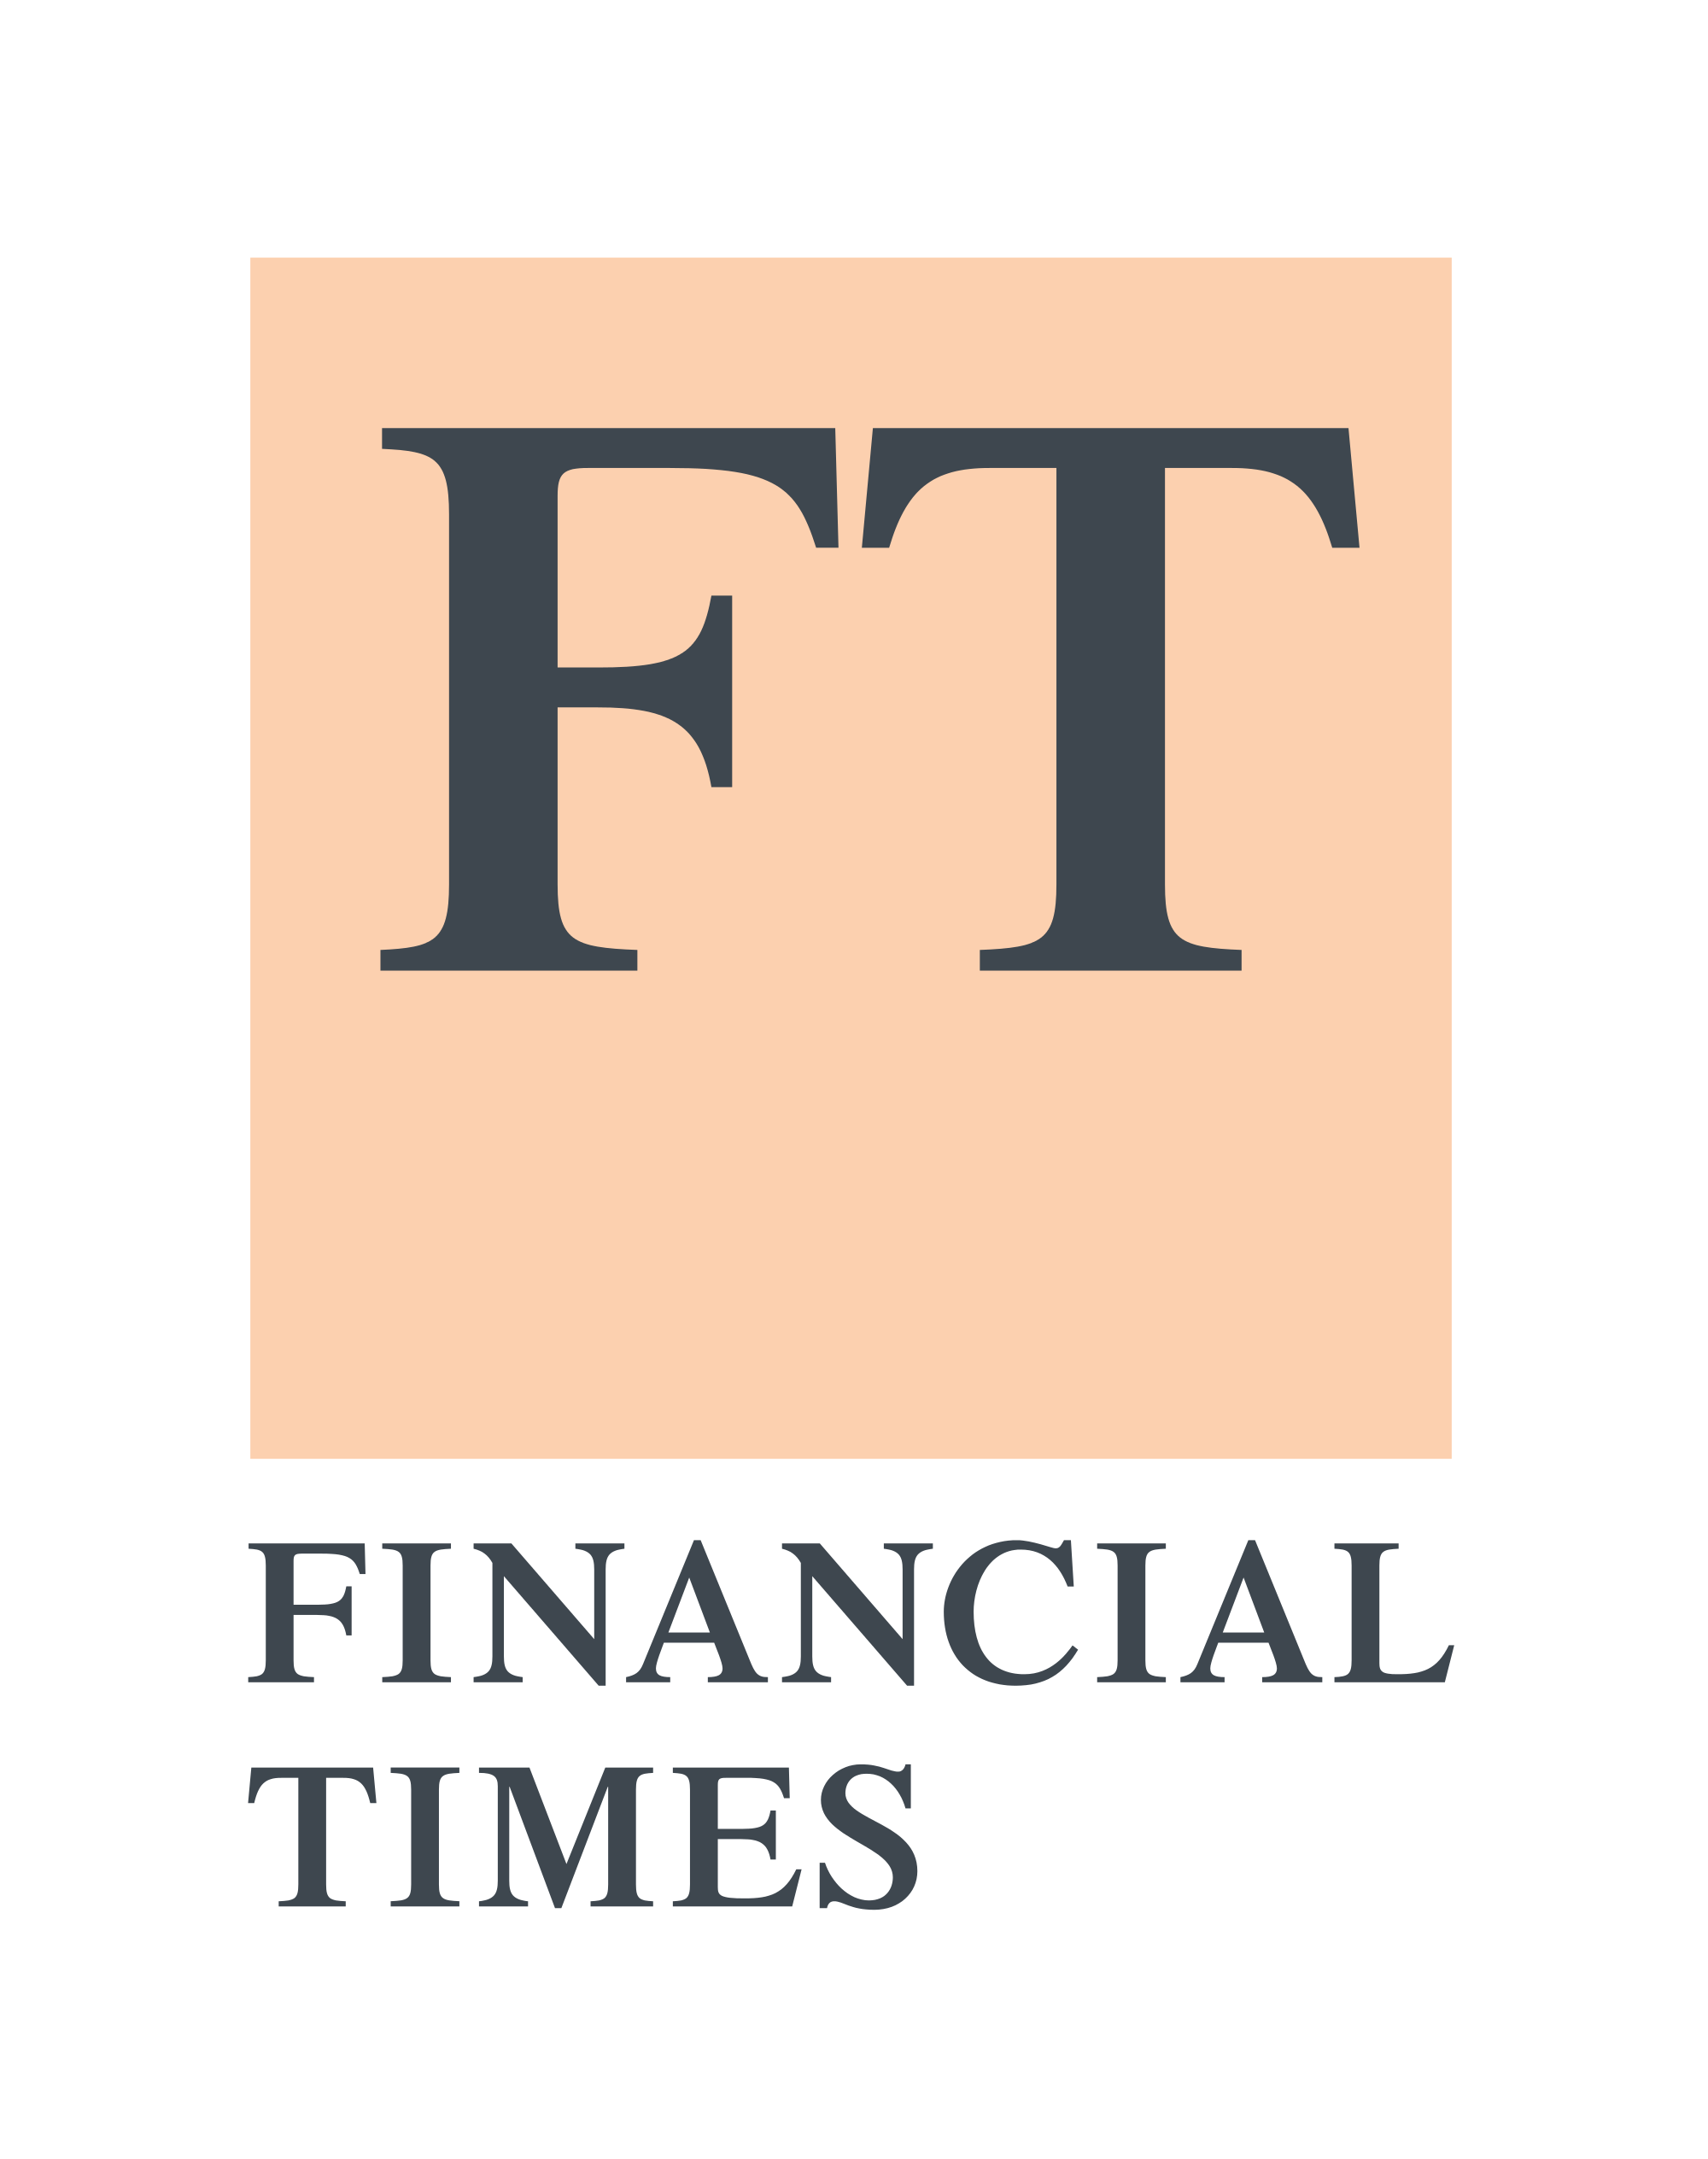 finacial times.png